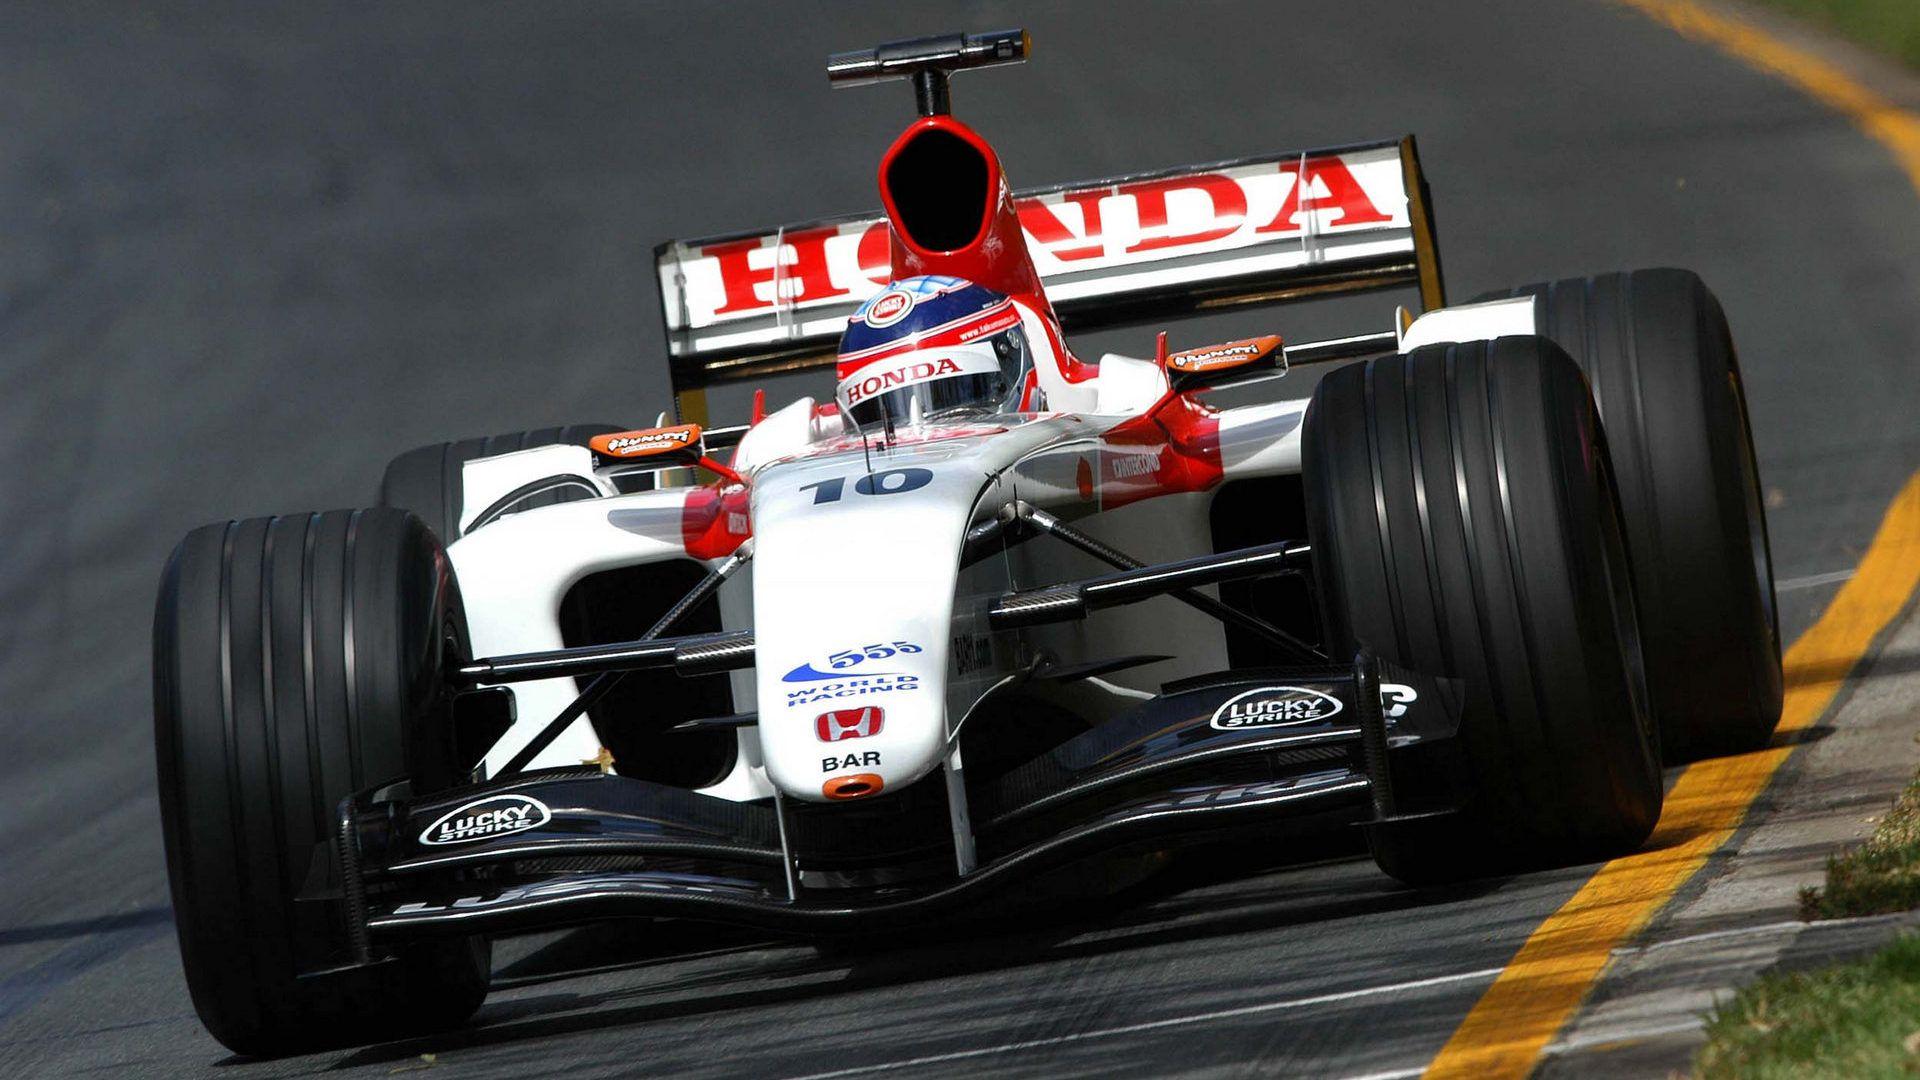 P8 Takuma Sato Jpn Bar Honda 006 34 Points Motorsport